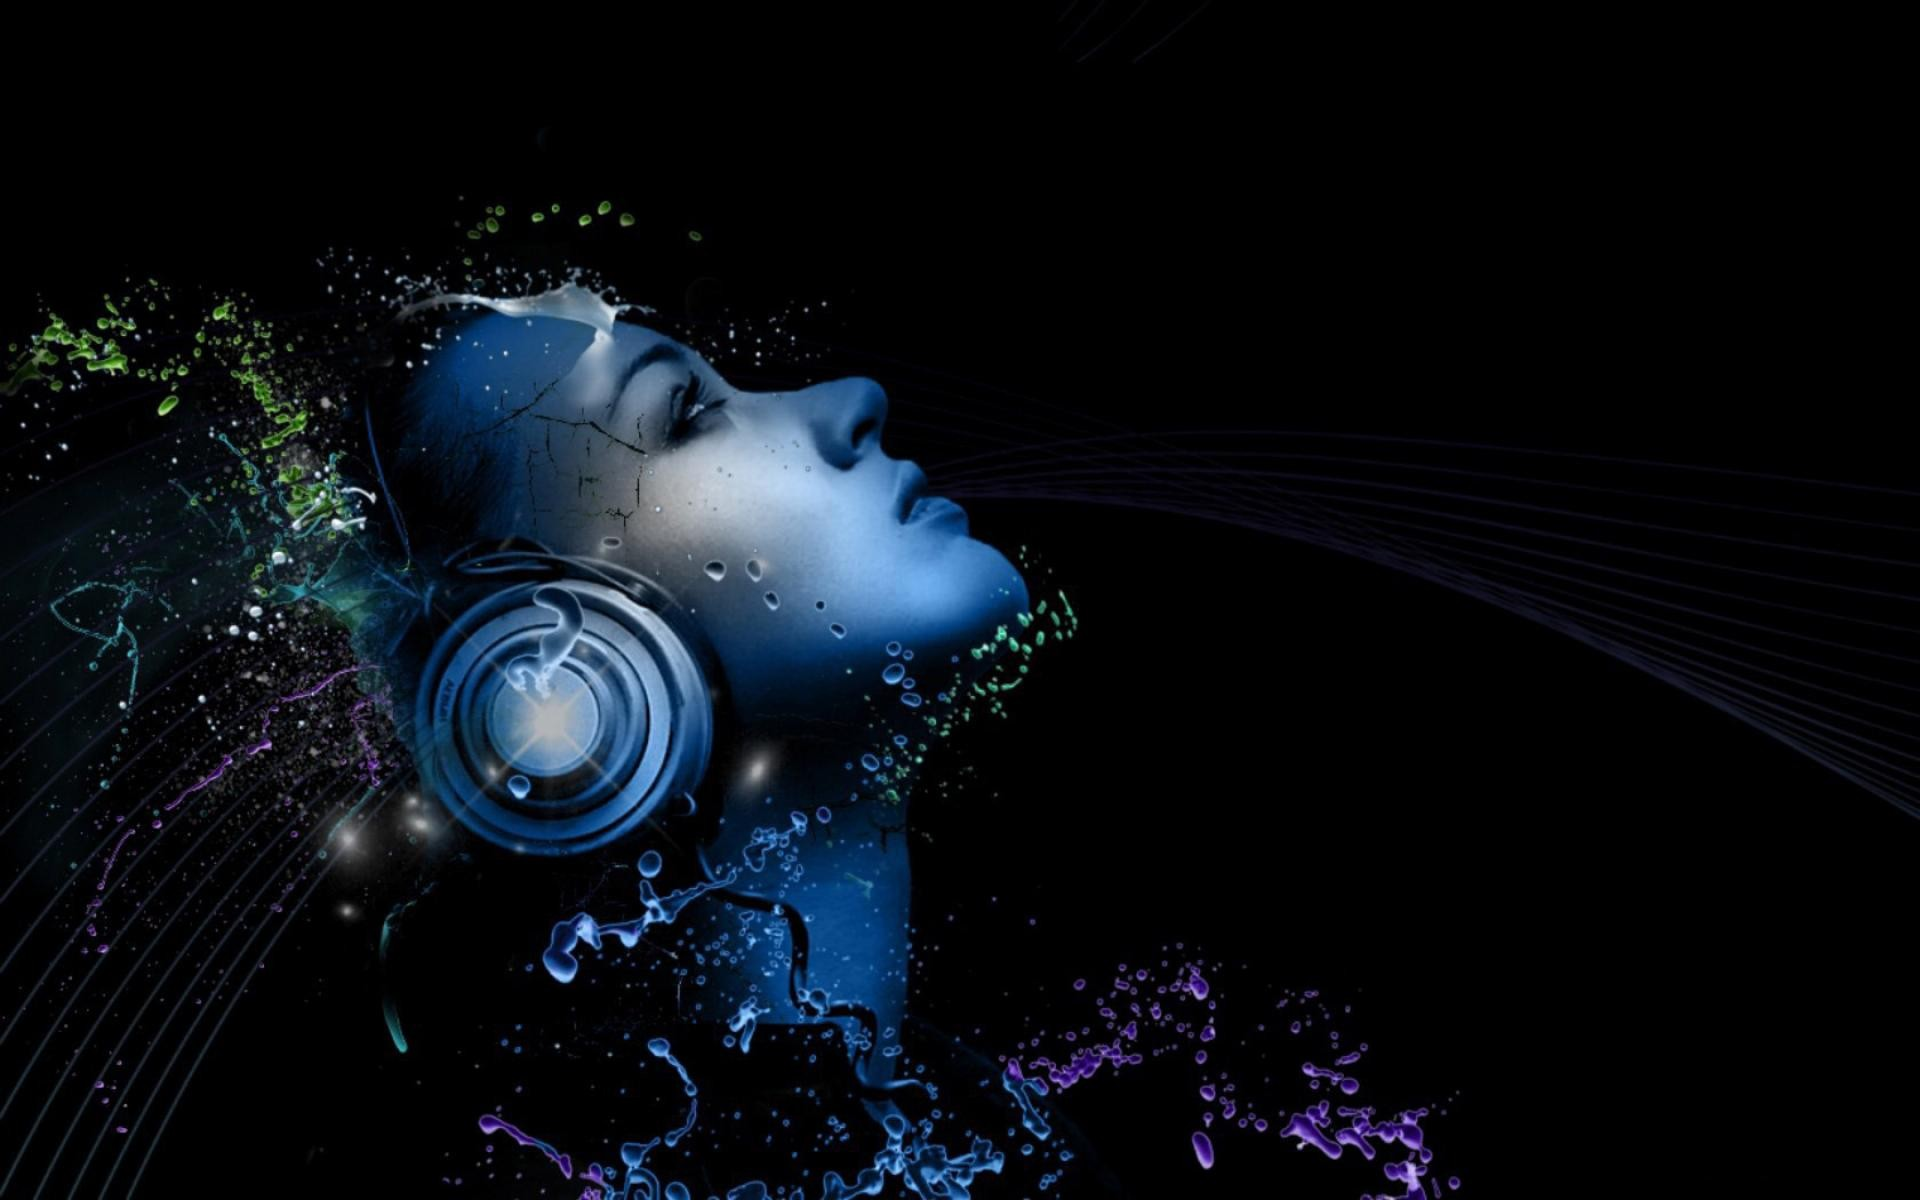 wallpaper headphones light music images 1920x1200 1920x1200